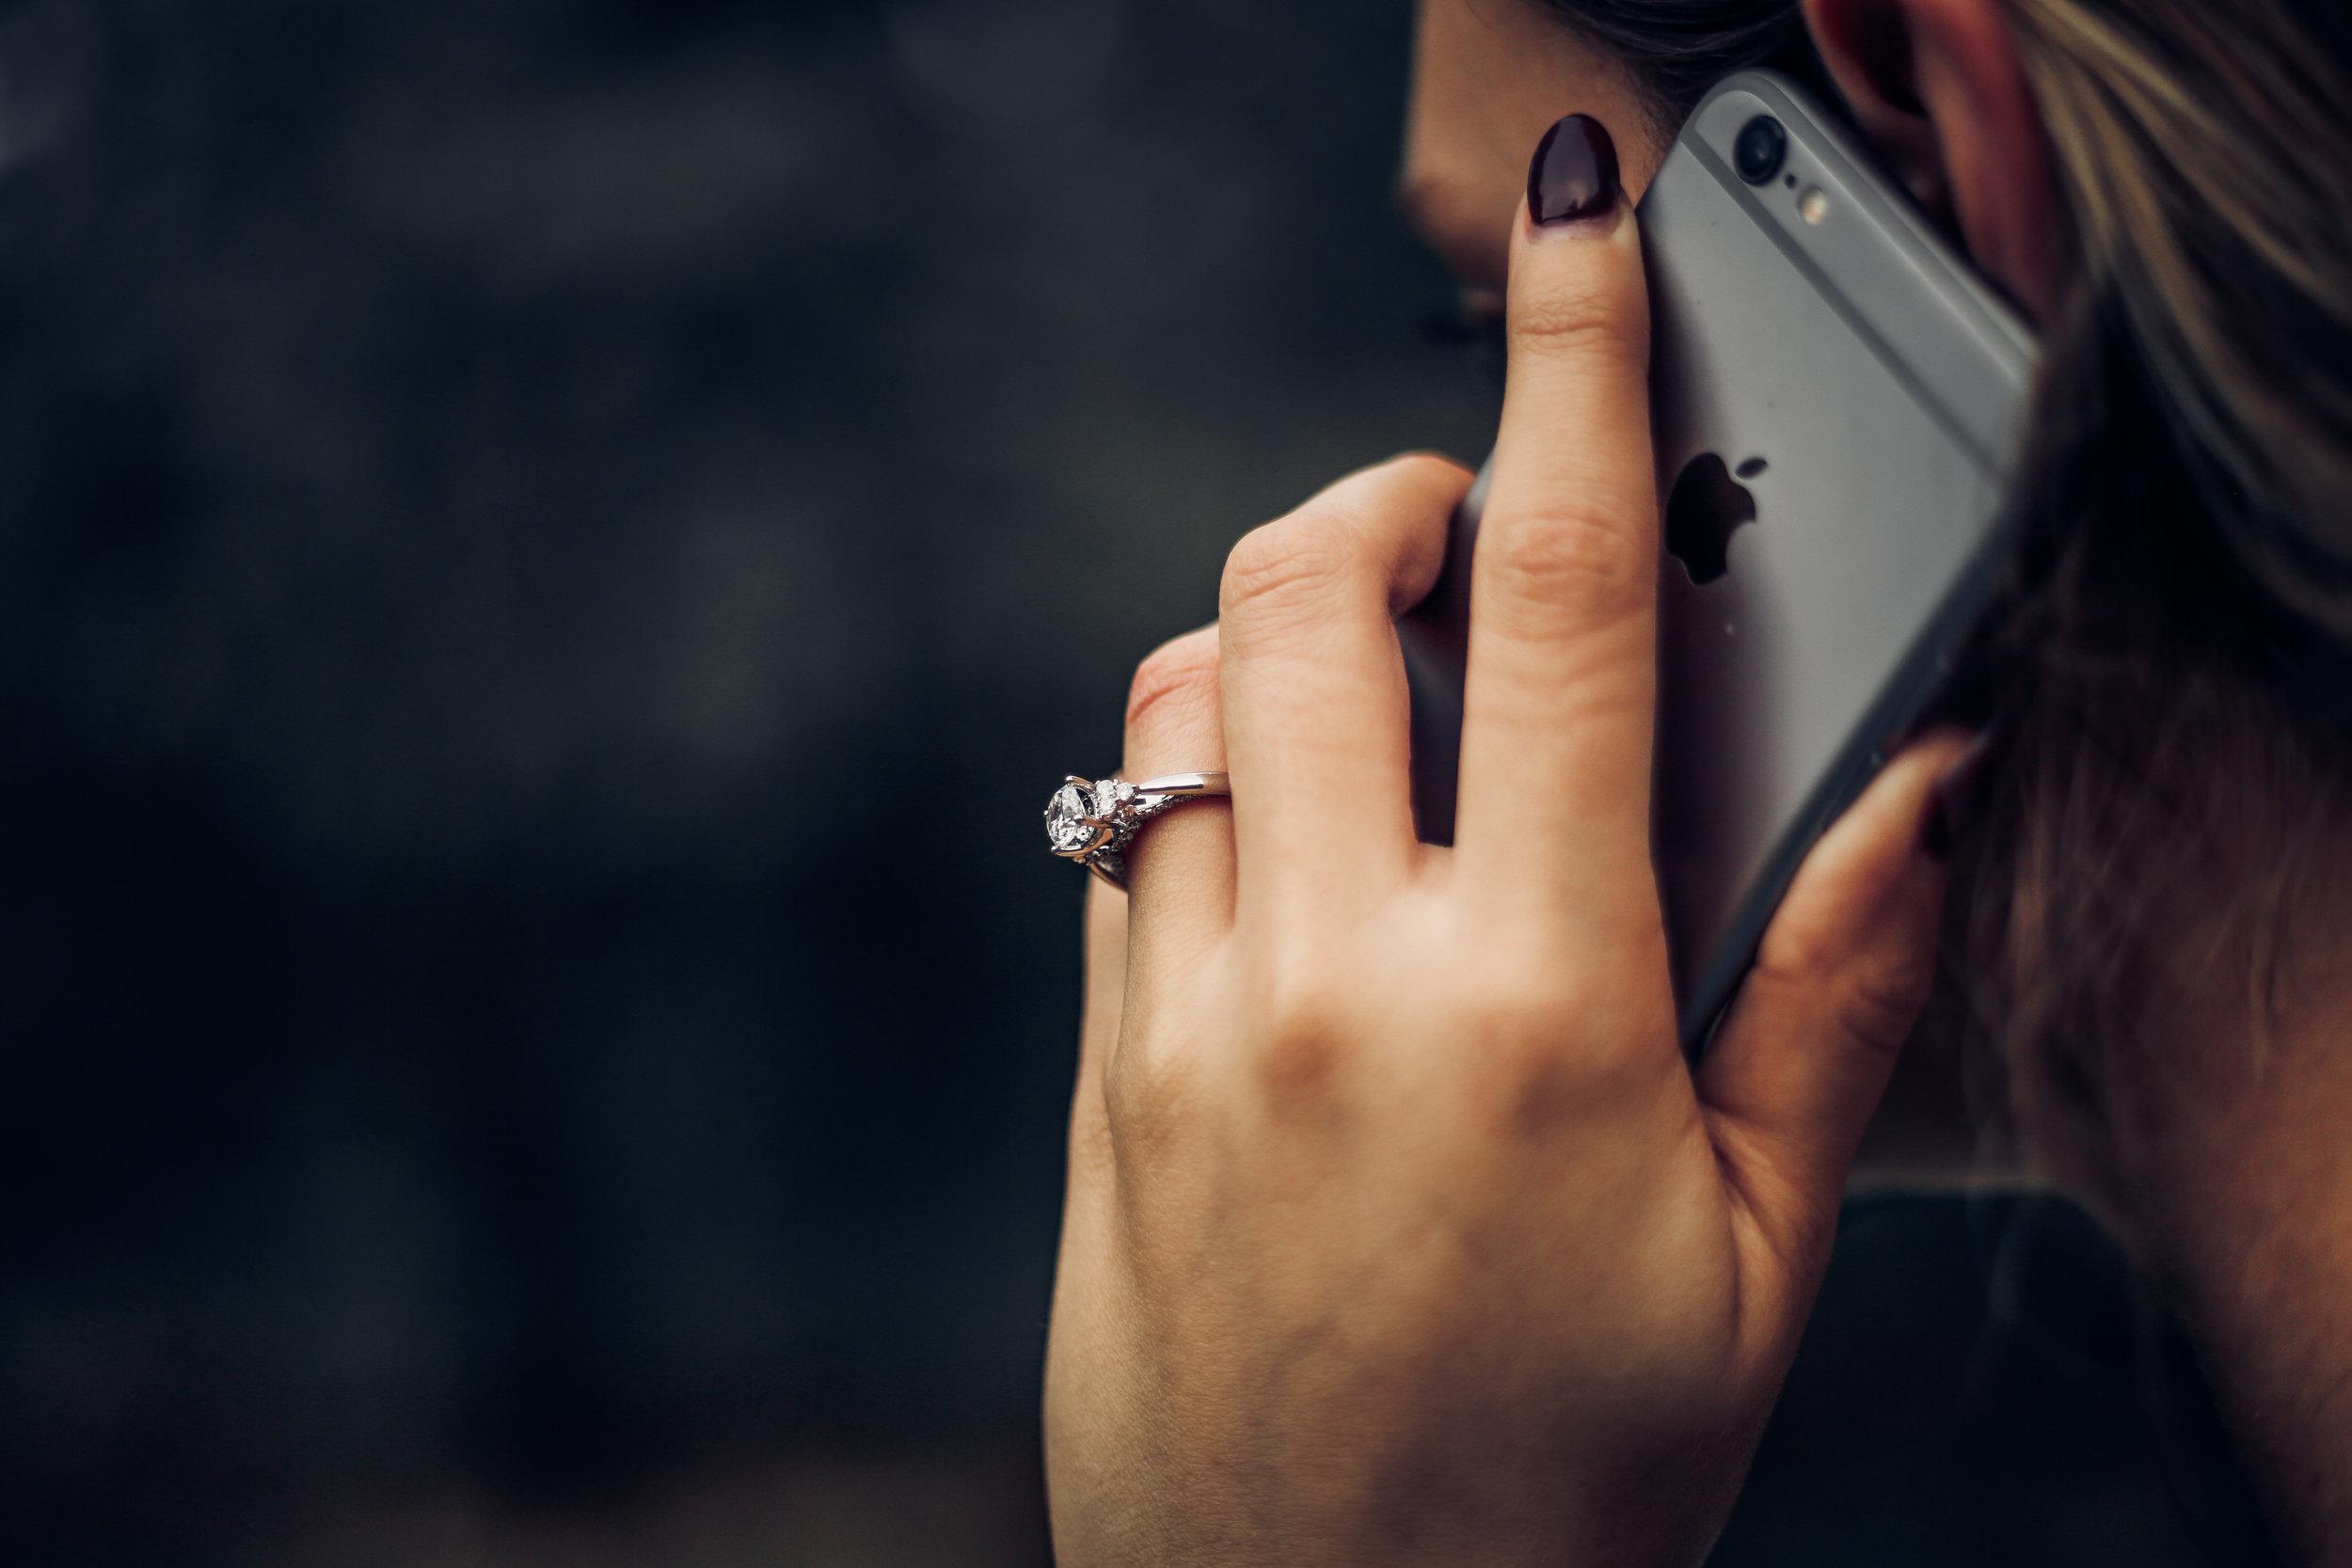 auxiliar de conversación calling Spanish consulate for student visa appointment